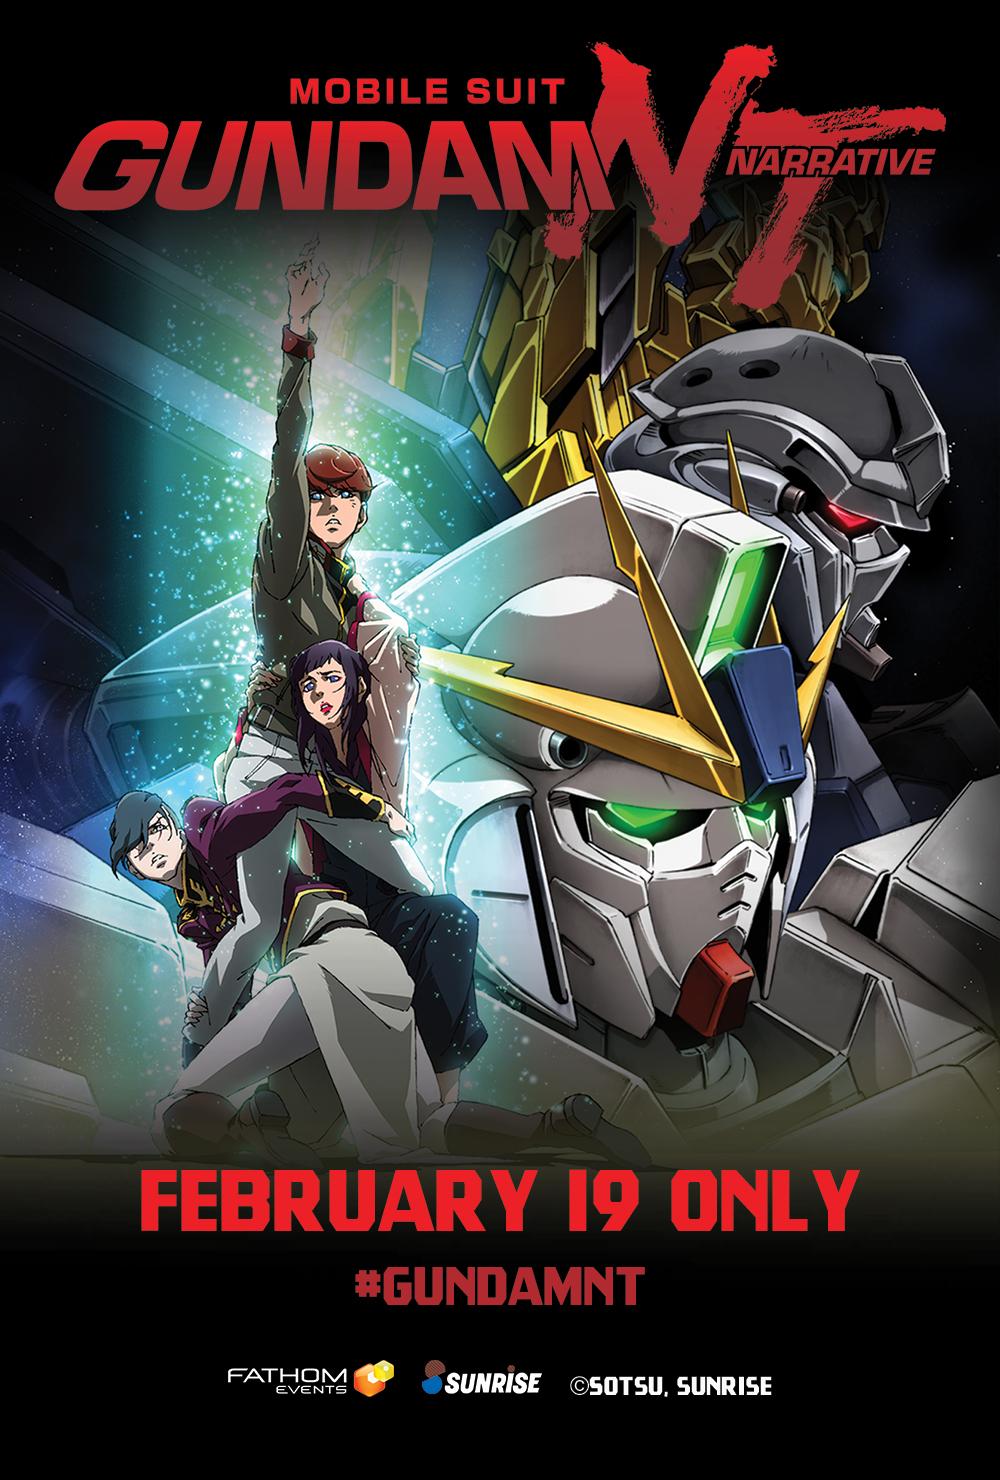 NekoPOP-Mobile-Suit-Gundam-NT-Fathom-2019-B